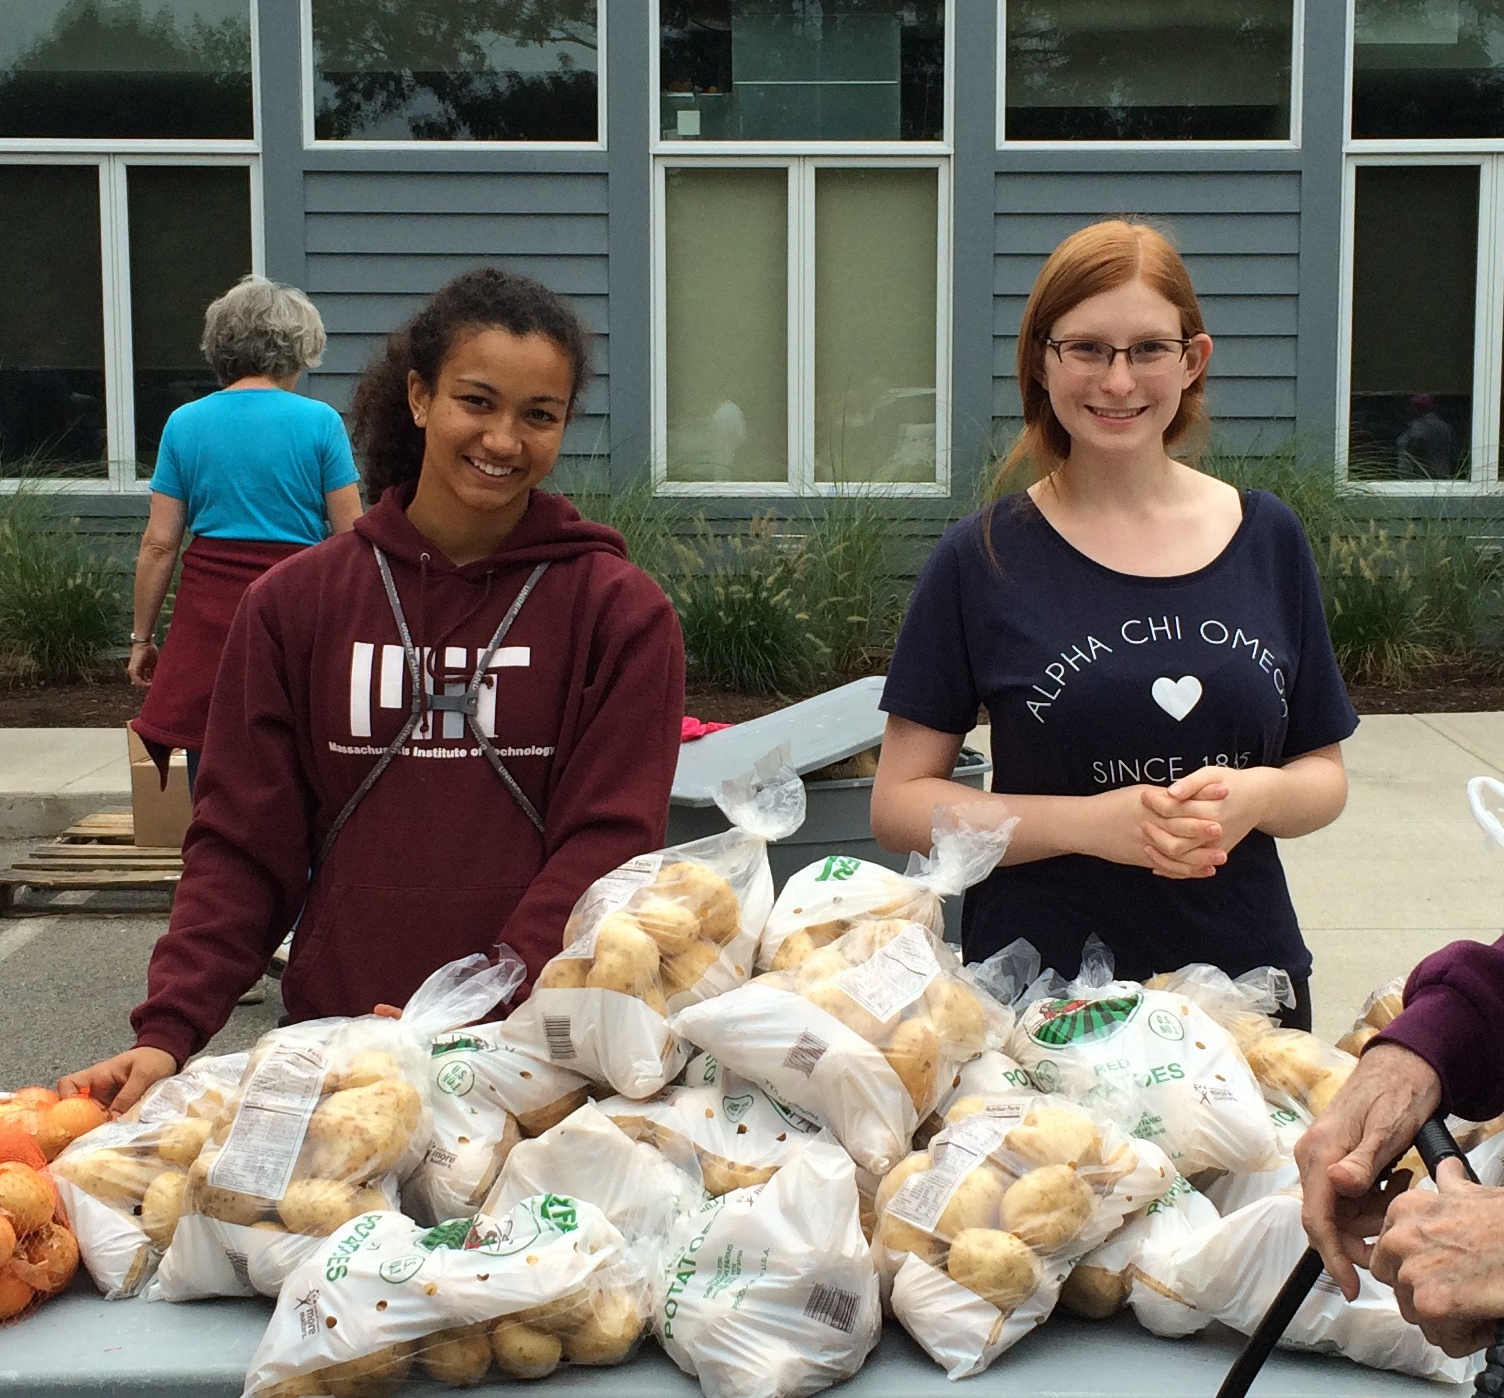 Volunteers distributing donations of potatoes